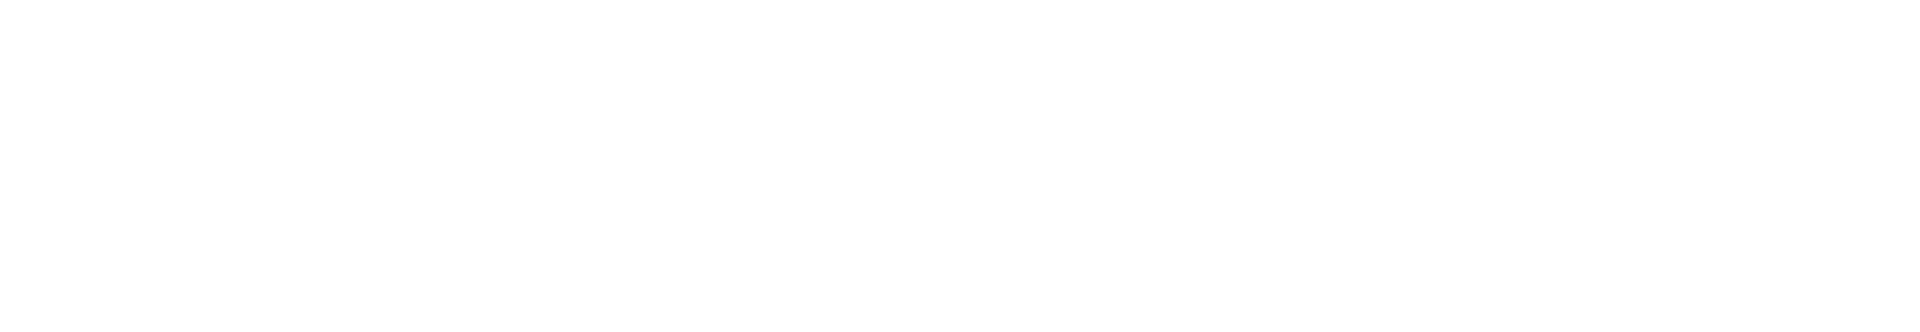 curva blanca